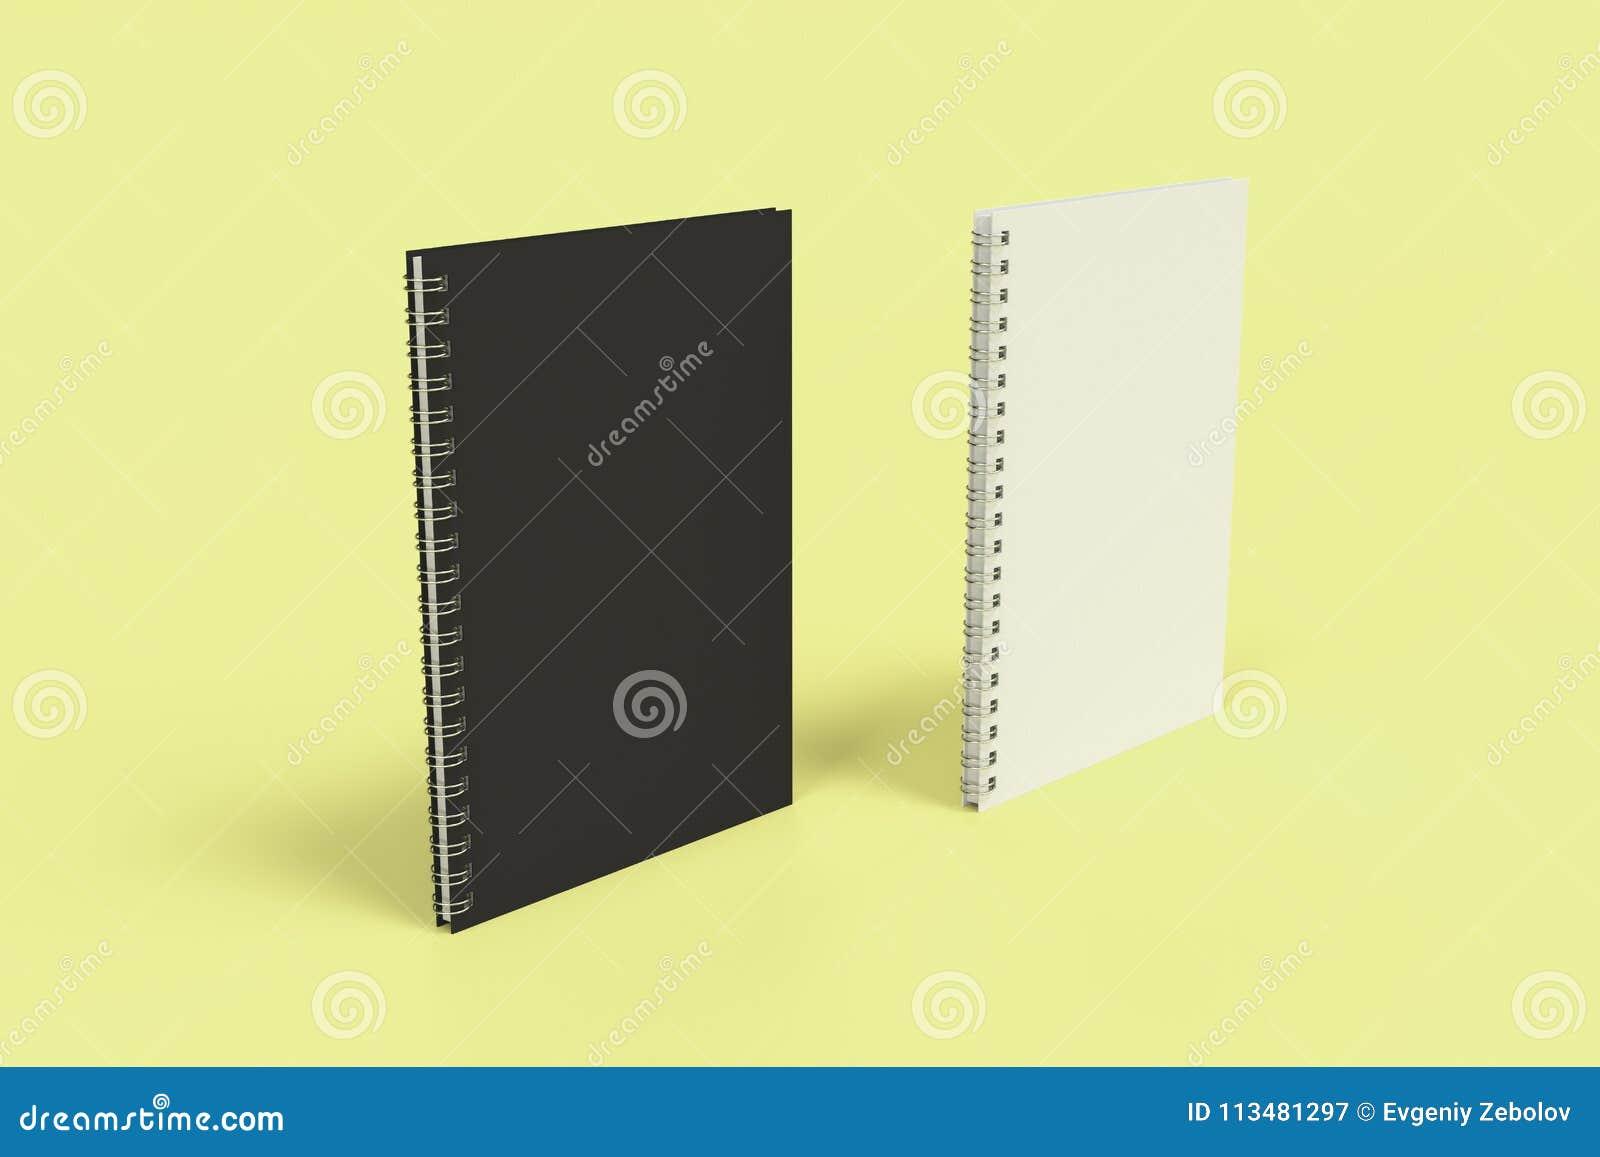 Dos cuadernos con espiral - limite en fondo amarillo